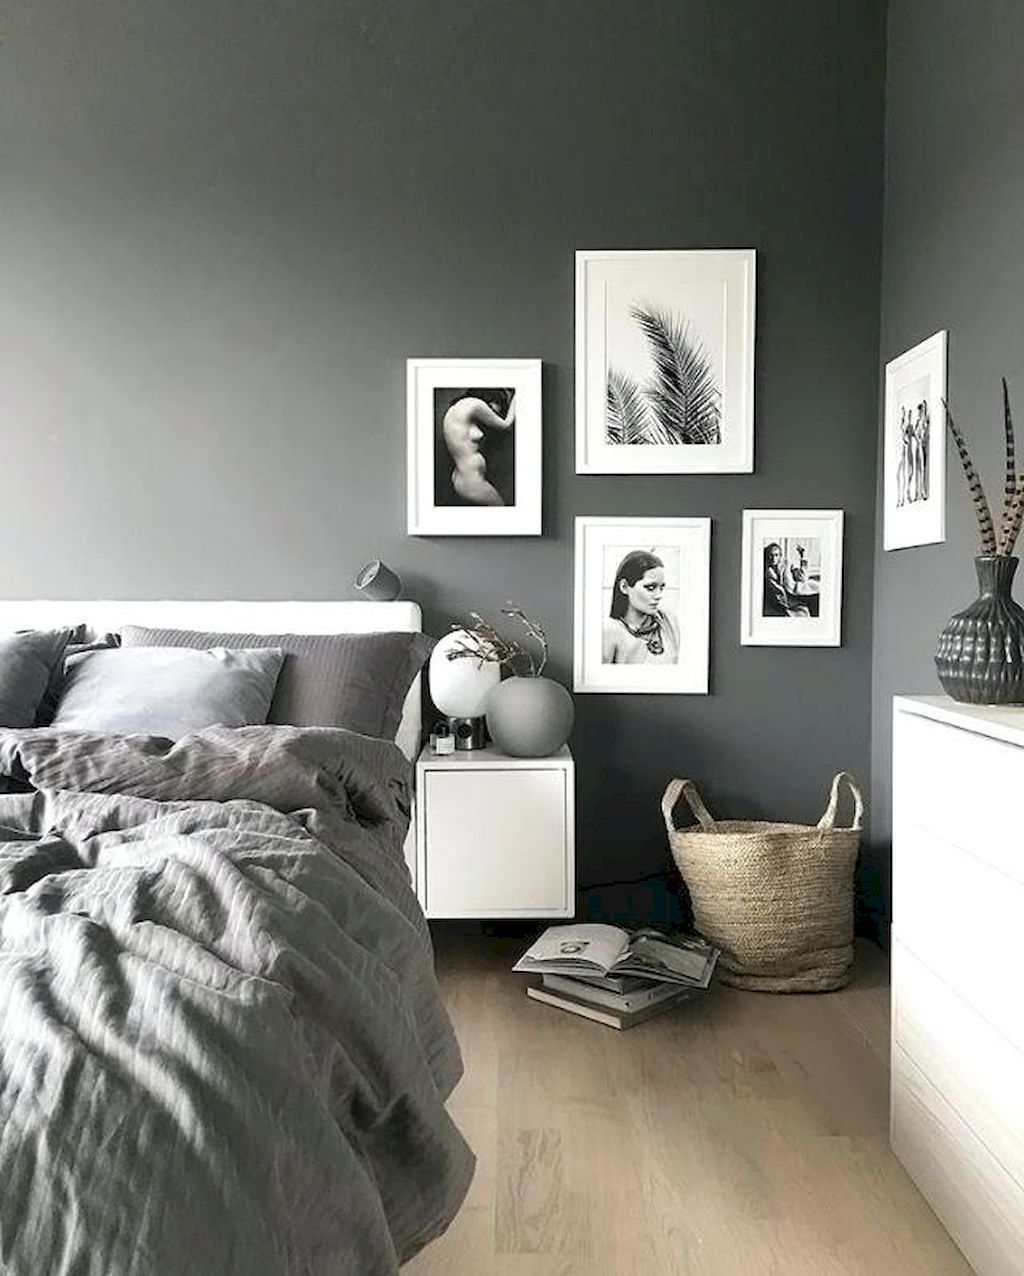 Easy Decor Hacks To Make Stunning Bedroom Design Elonahome Com Inspiration Stylish Grey